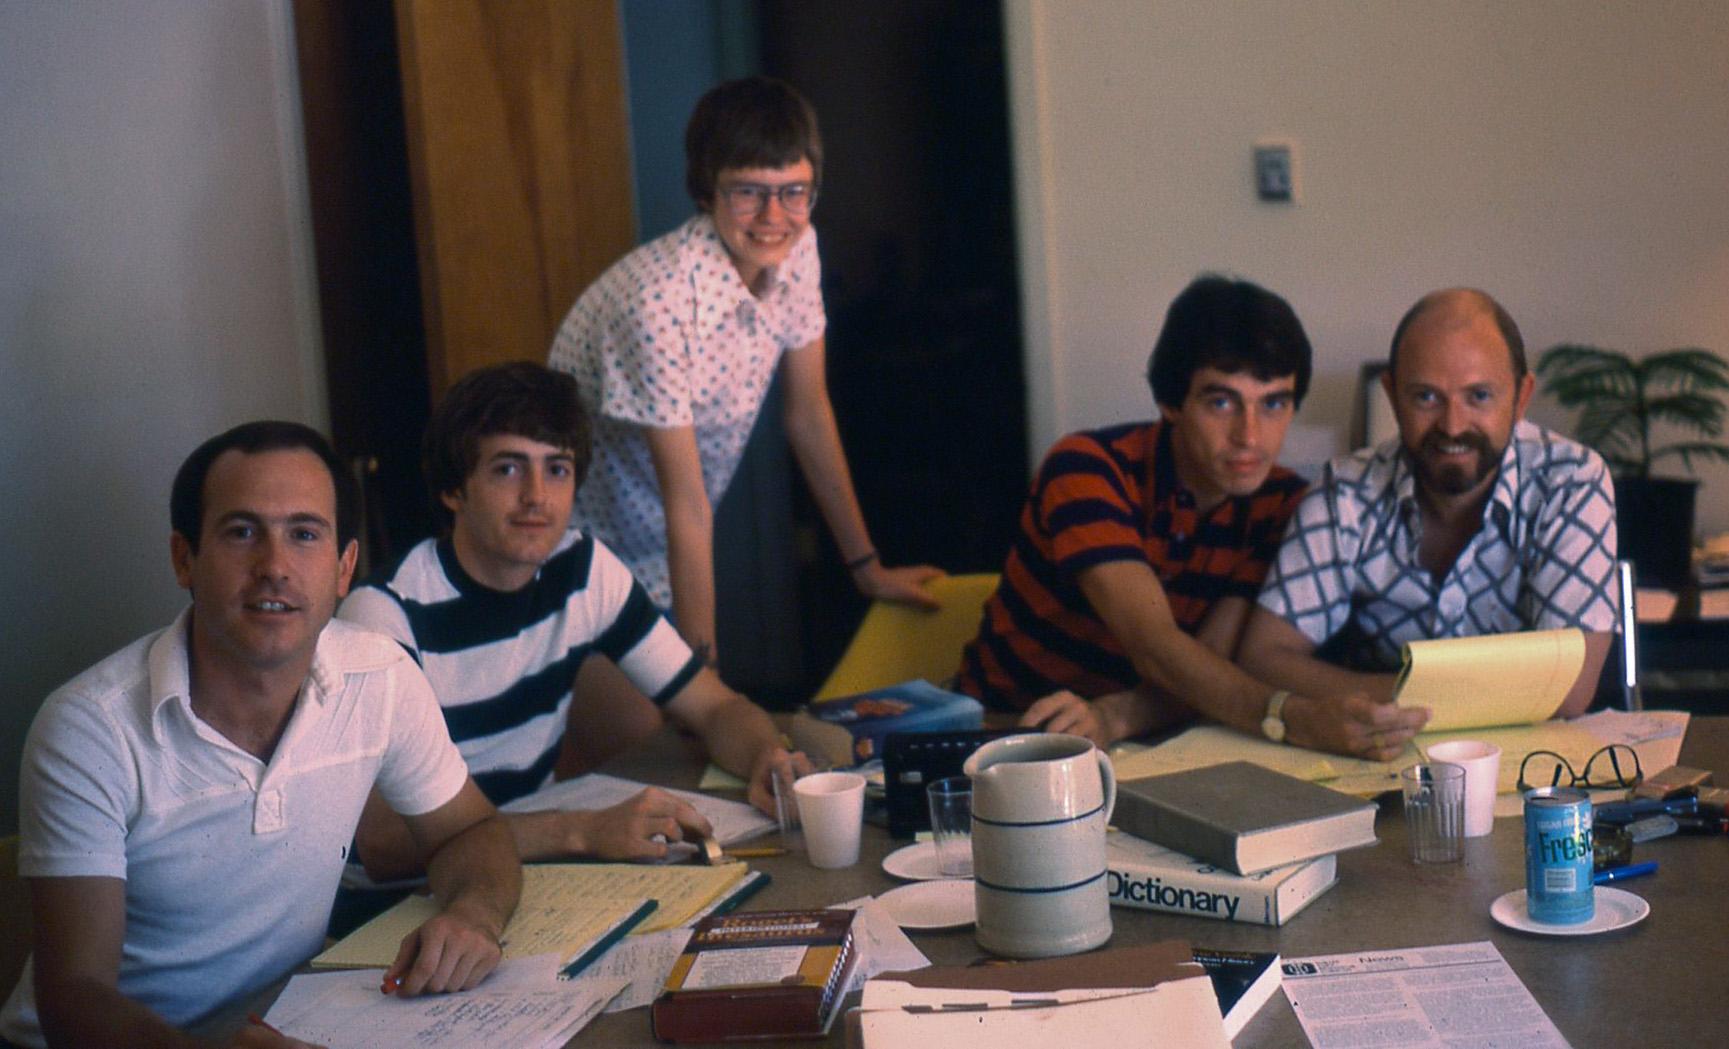 DGPC Retreat 1977: Don Baker, Dick Peeples, Louise Young, Steve Wilkins, Jerry Ward